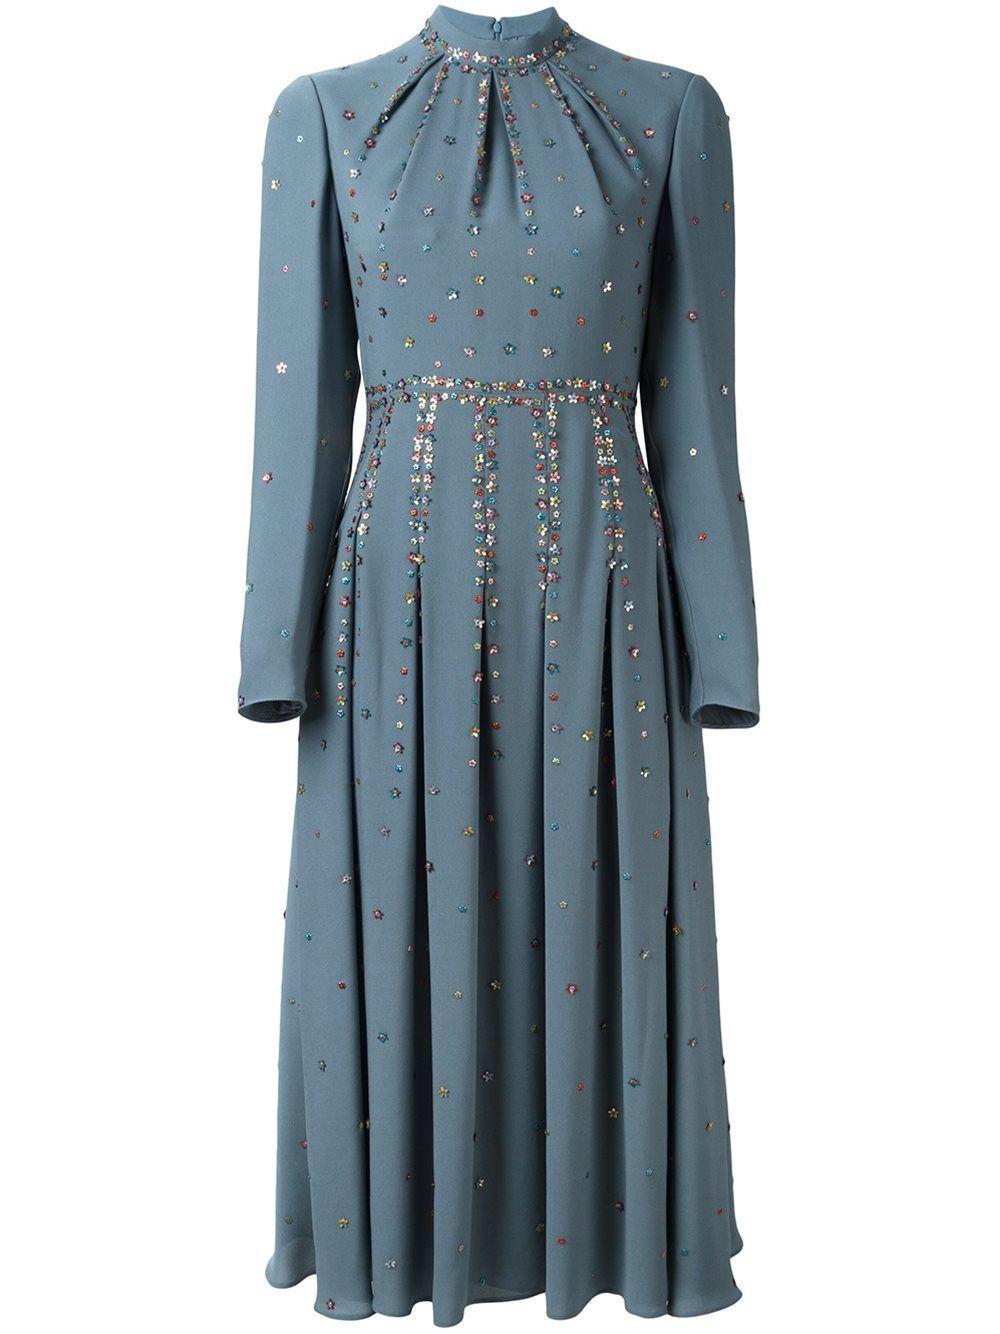 Valentino embellished midi dress Source by Kres_Yu # ...